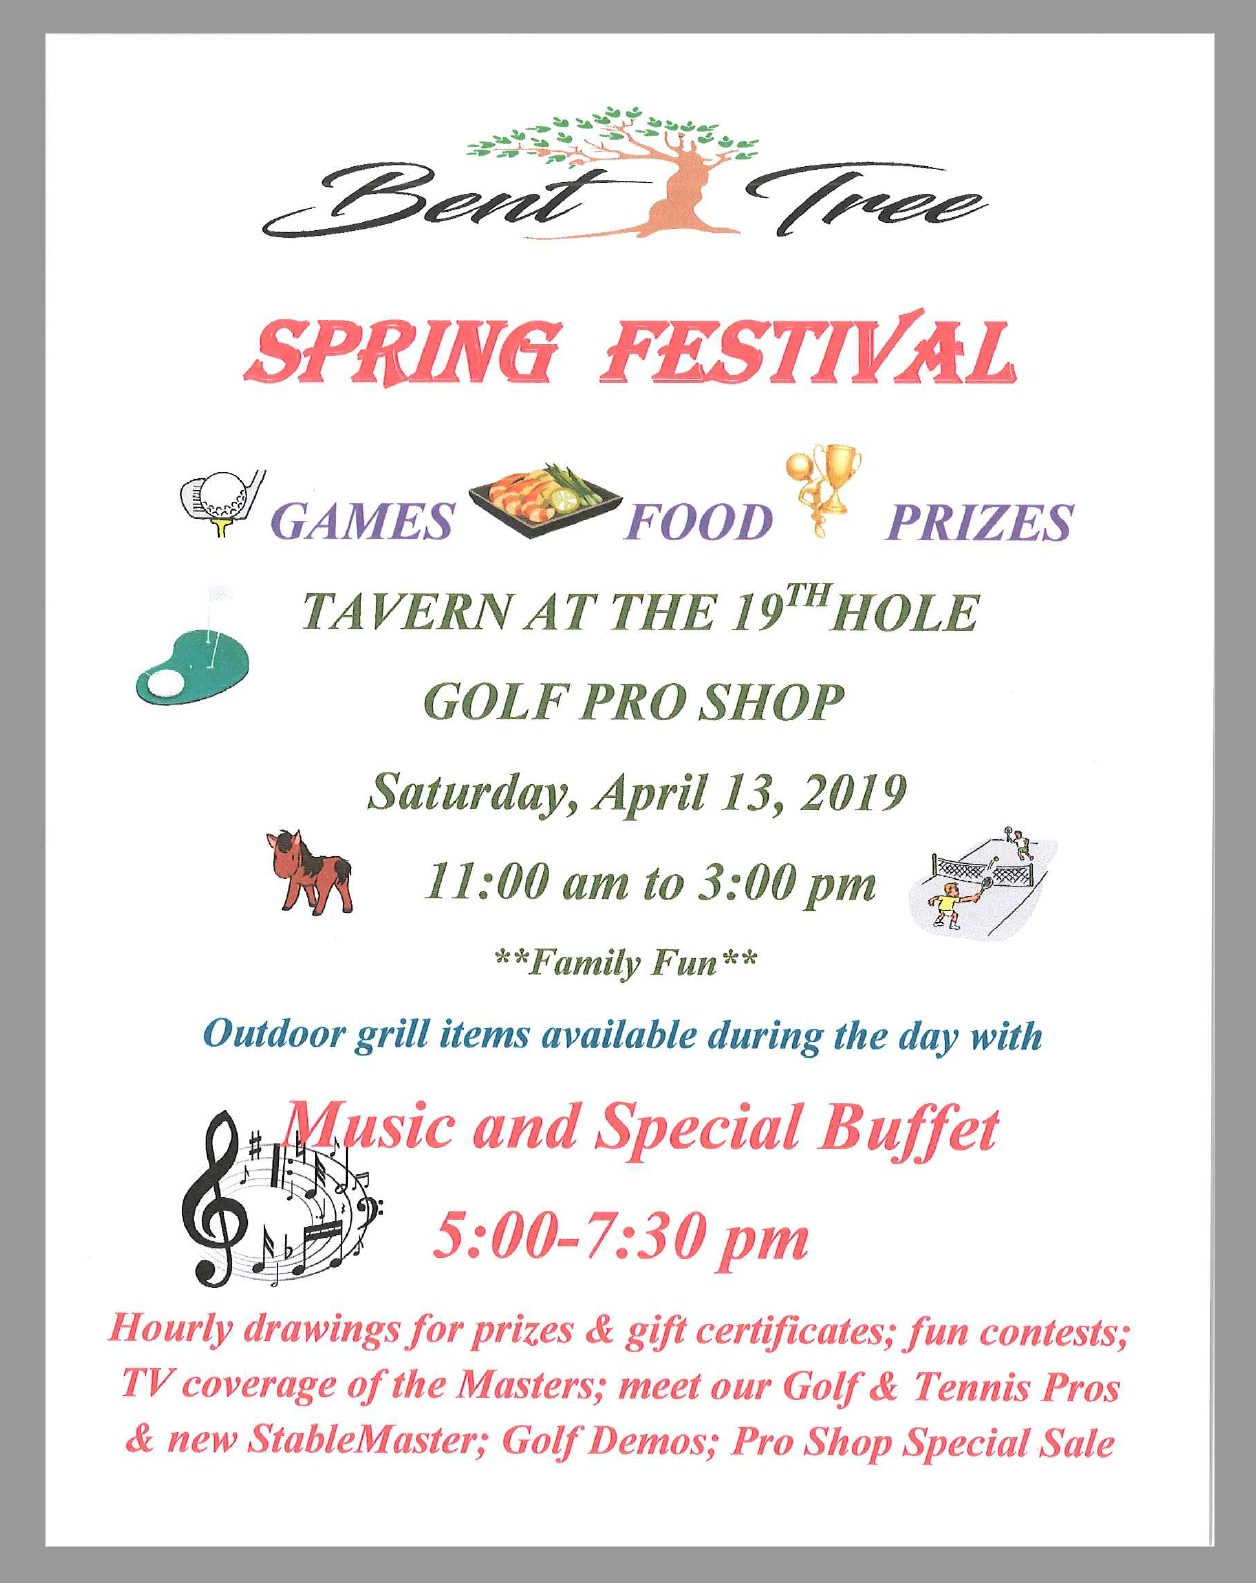 Bent Tree Spring Festival